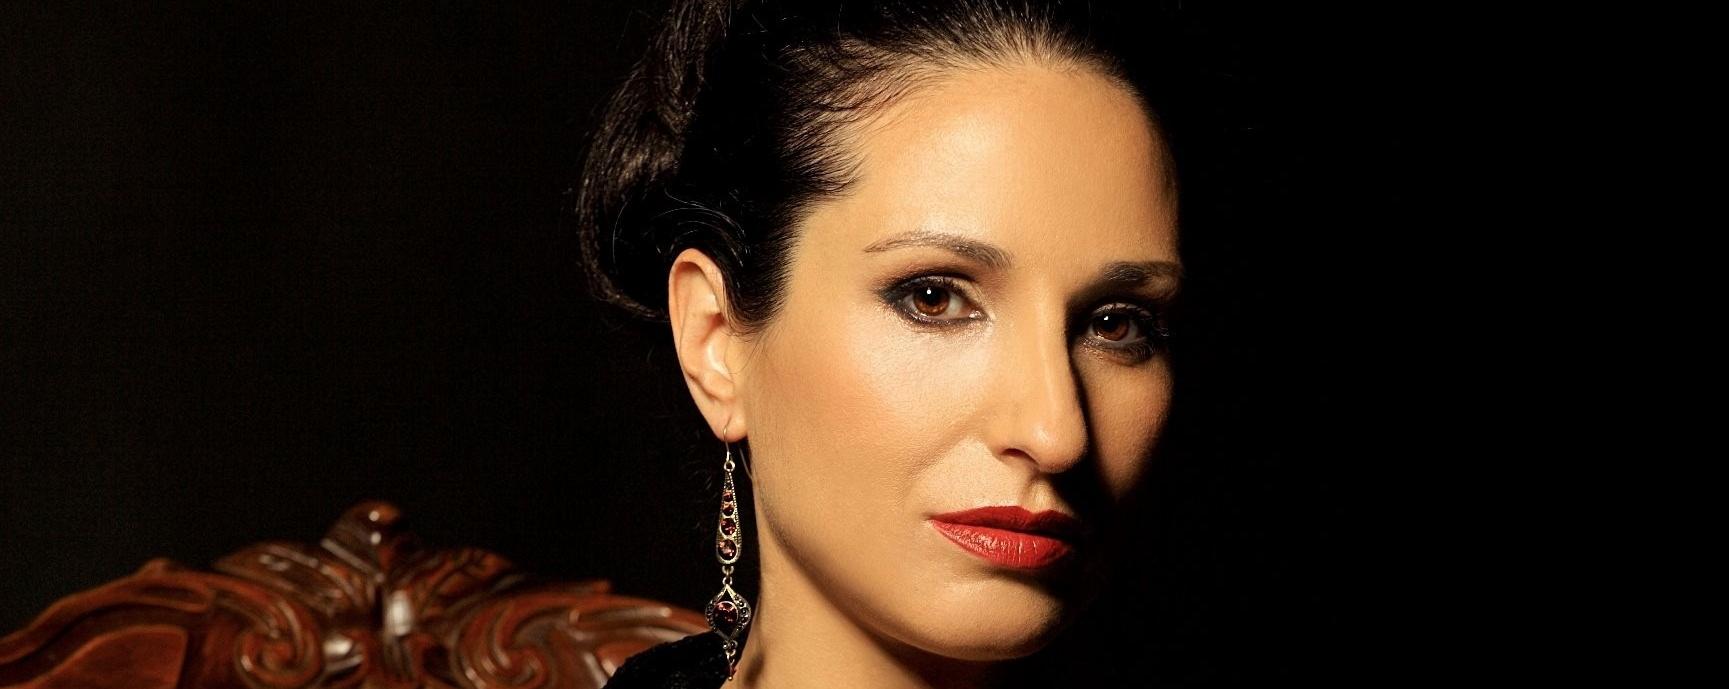 Gordana Kostic International Opera Singer at The Music Salon